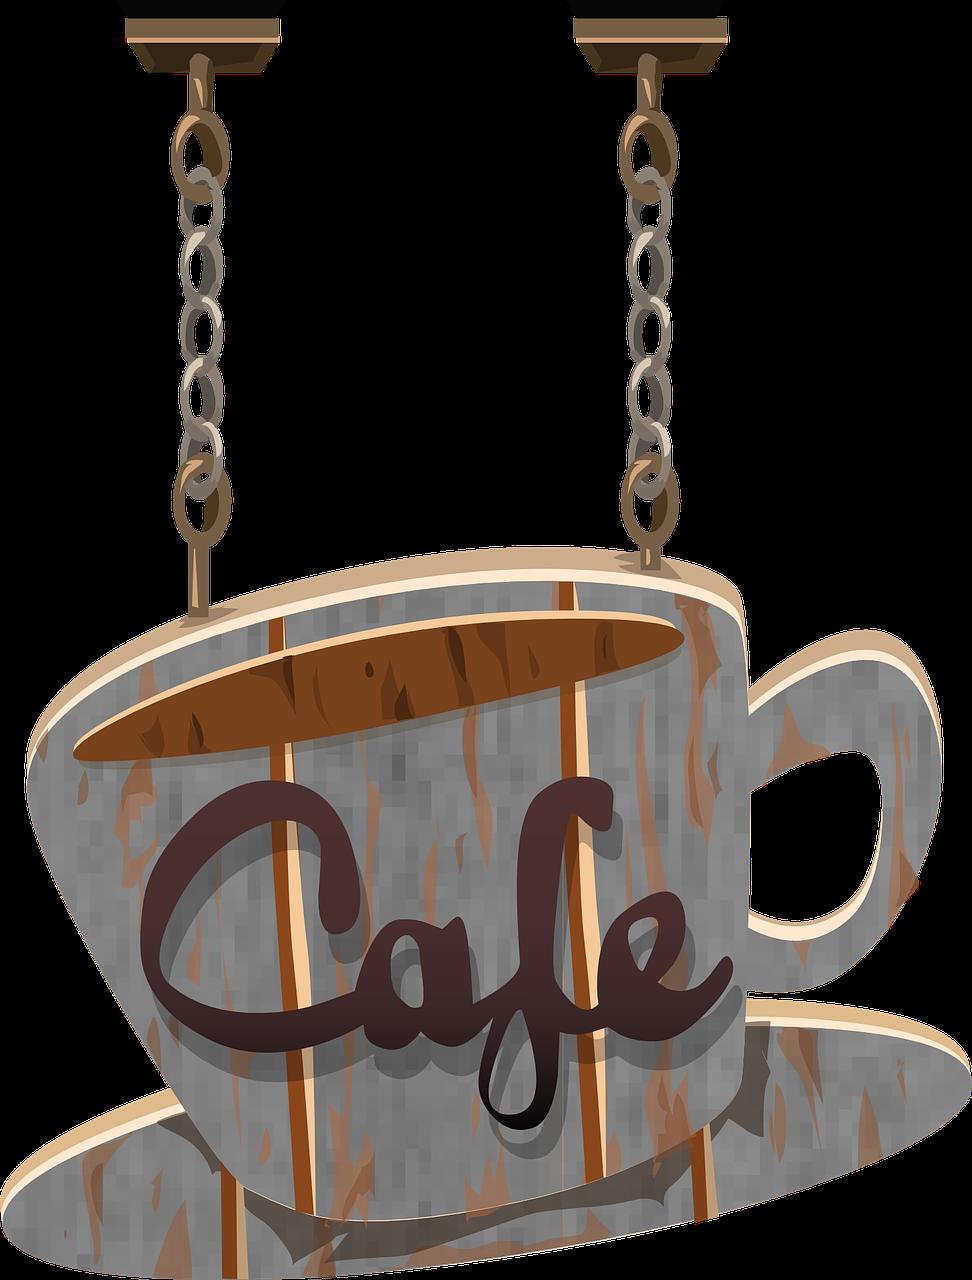 Кафе надпись картинки